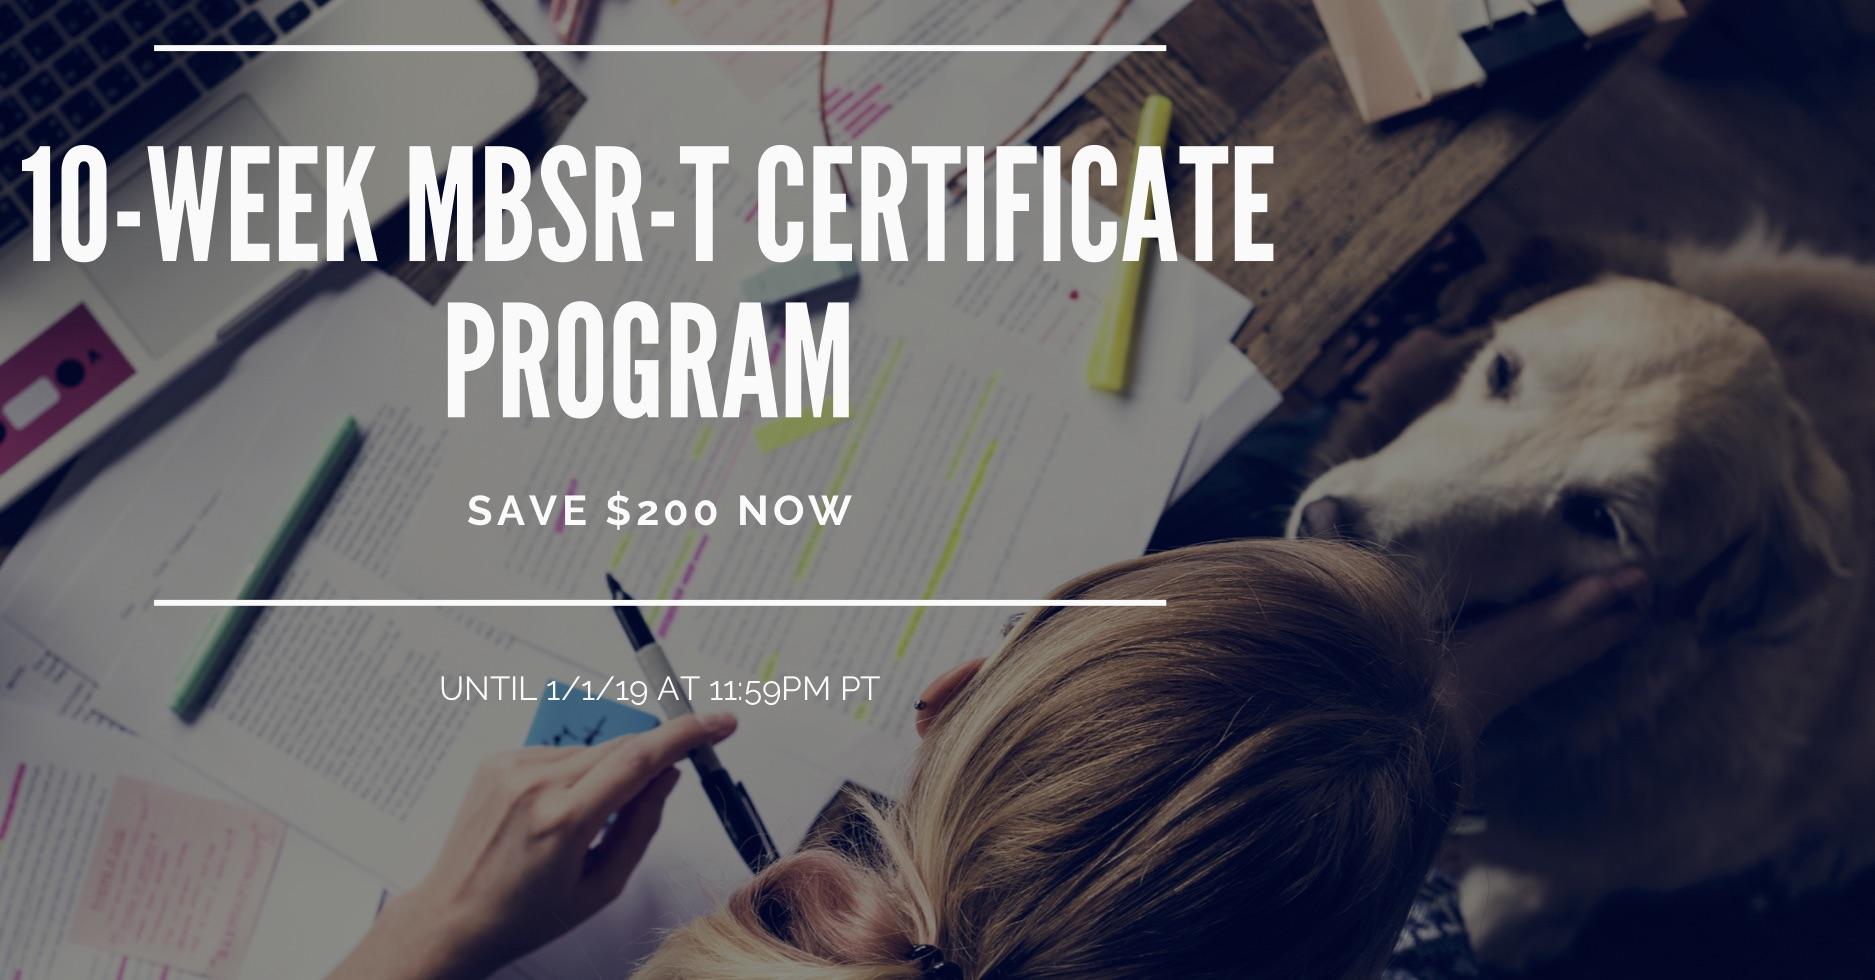 10-week mbsr-t certificate program.jpg